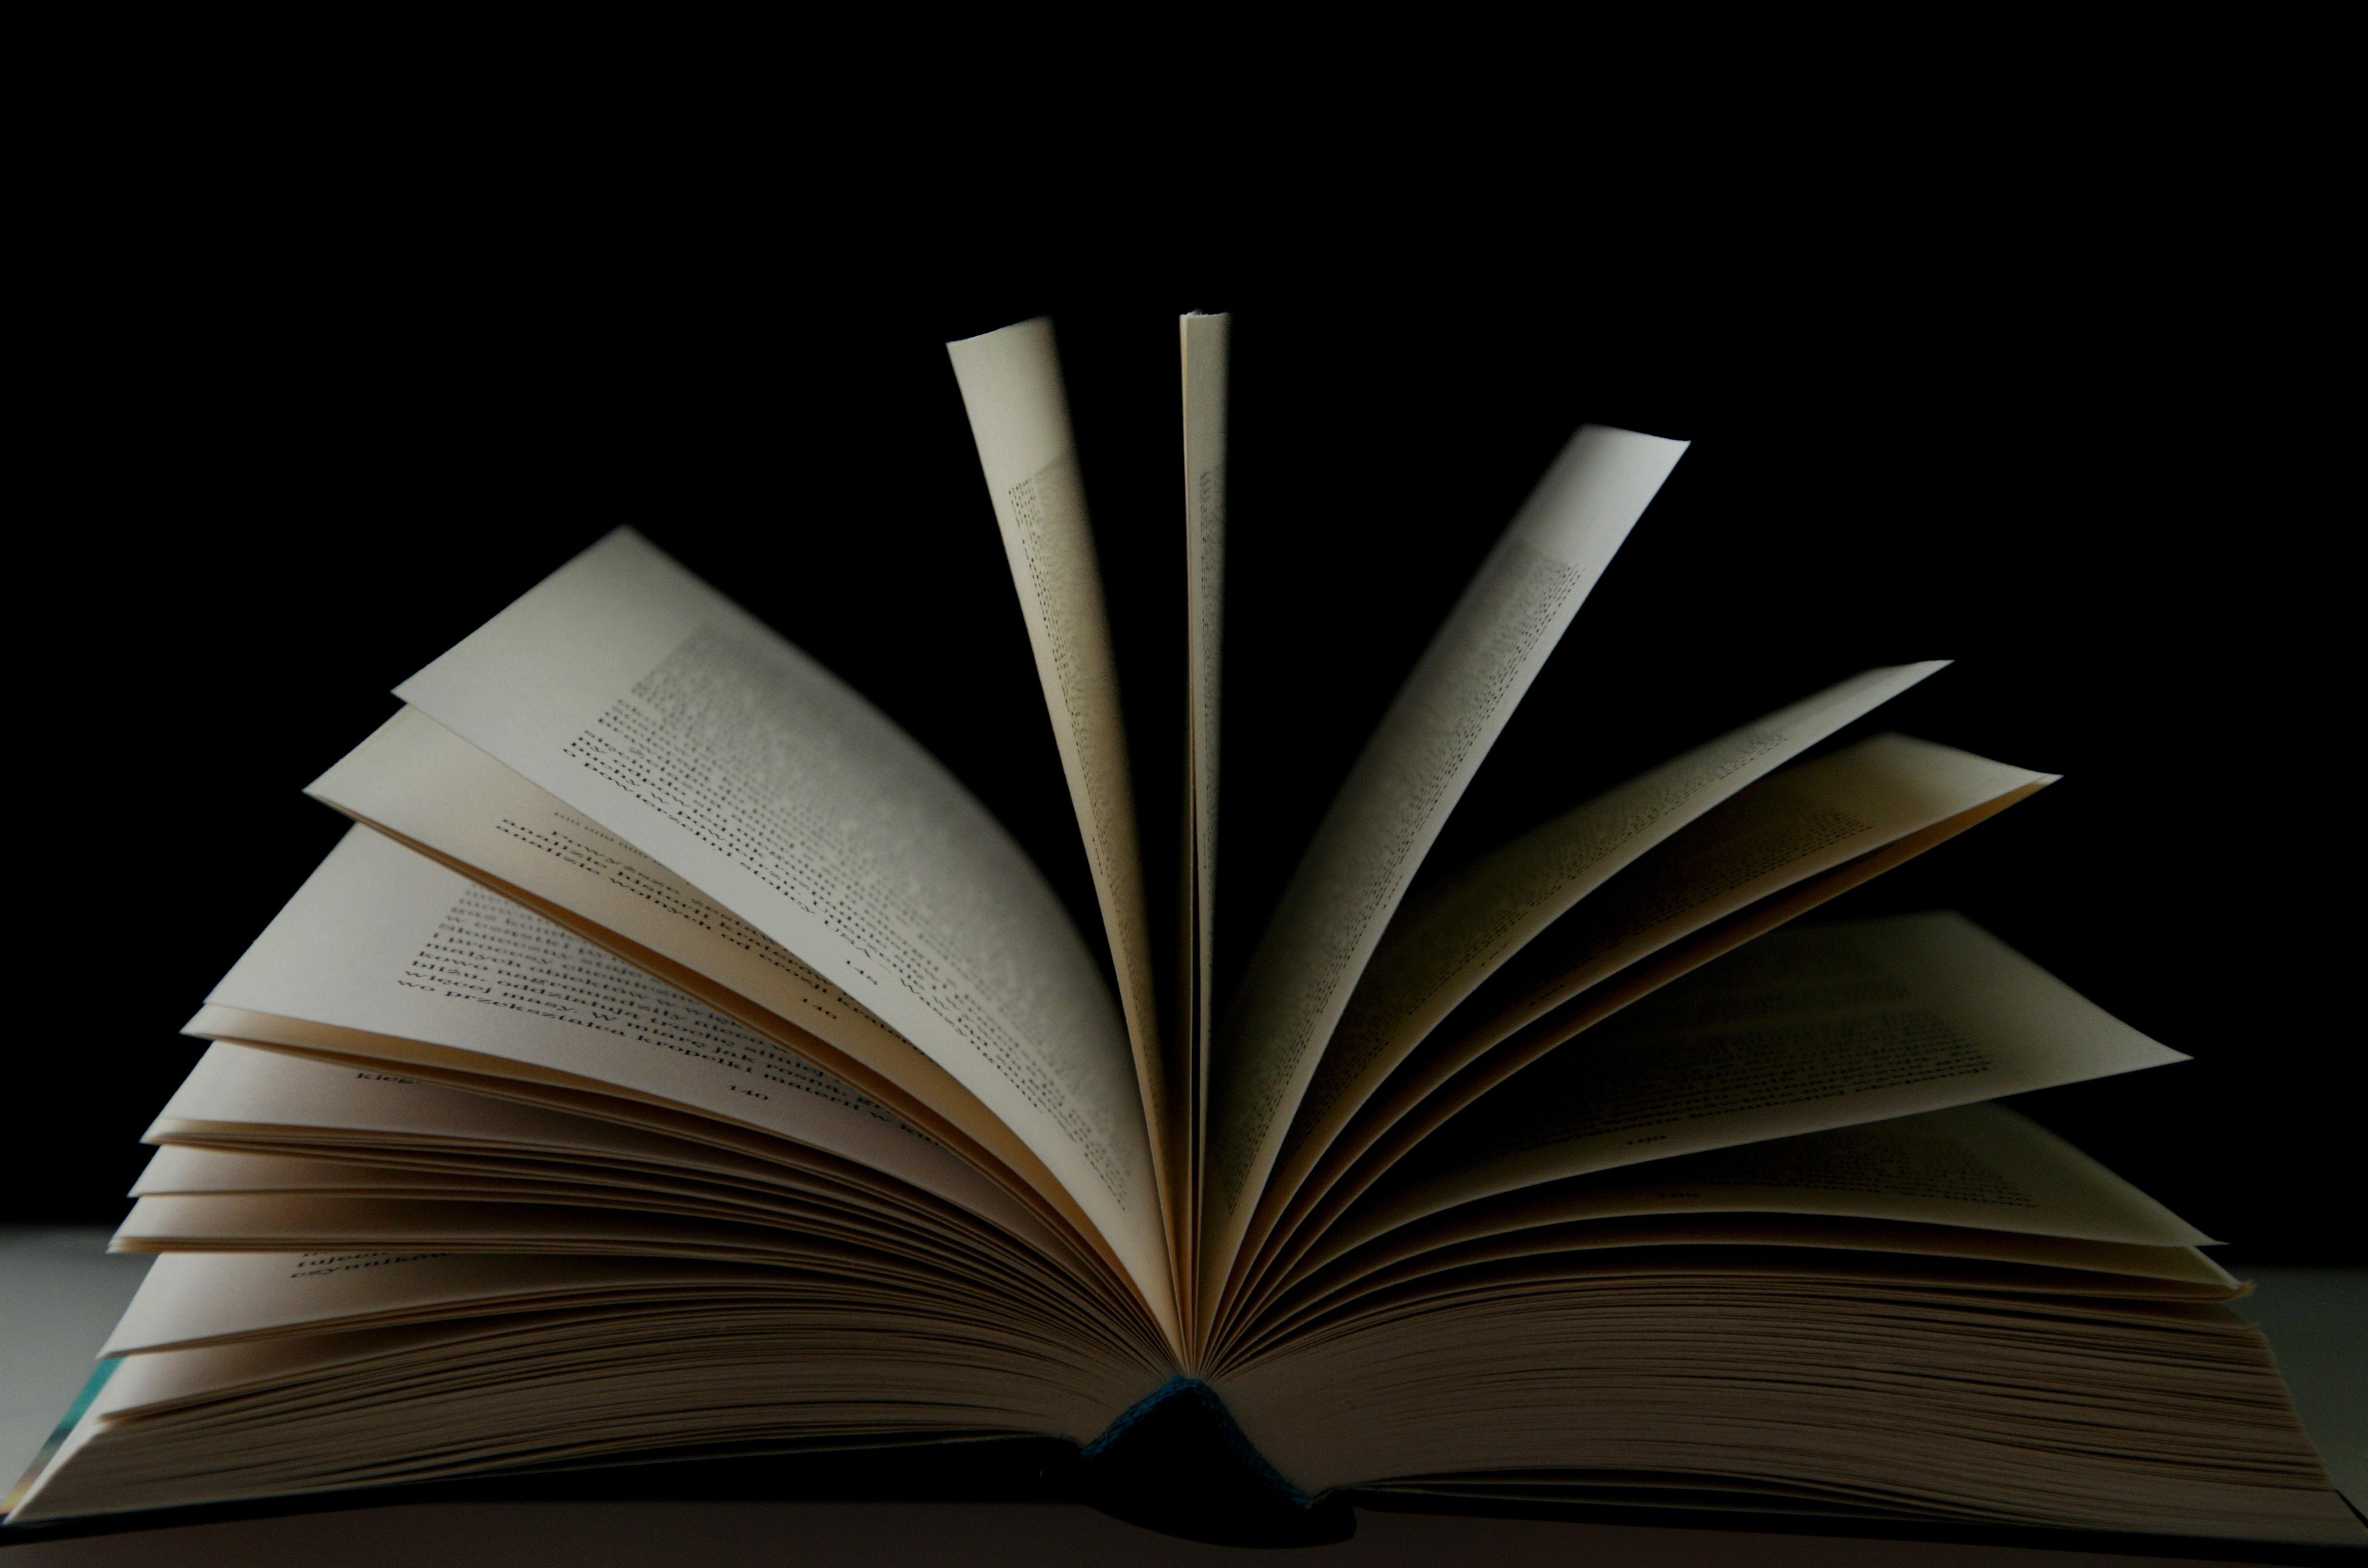 biblioteca-iti.jpg